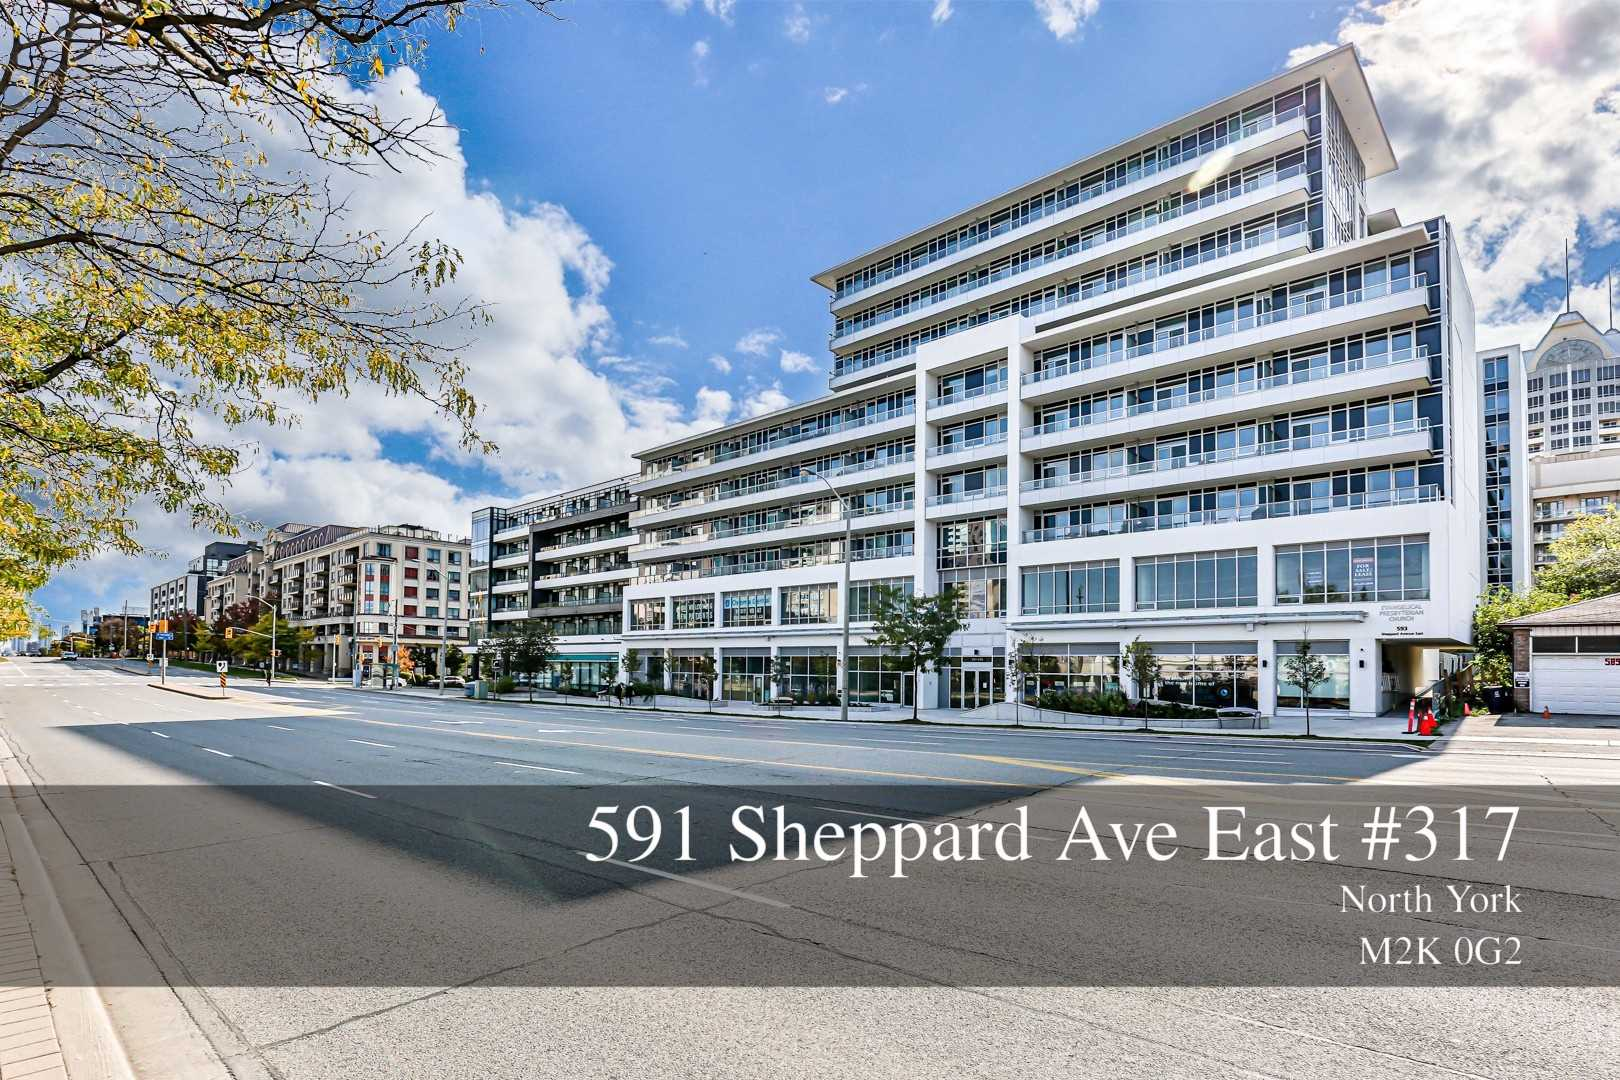 317 - 591 Sheppard Ave E